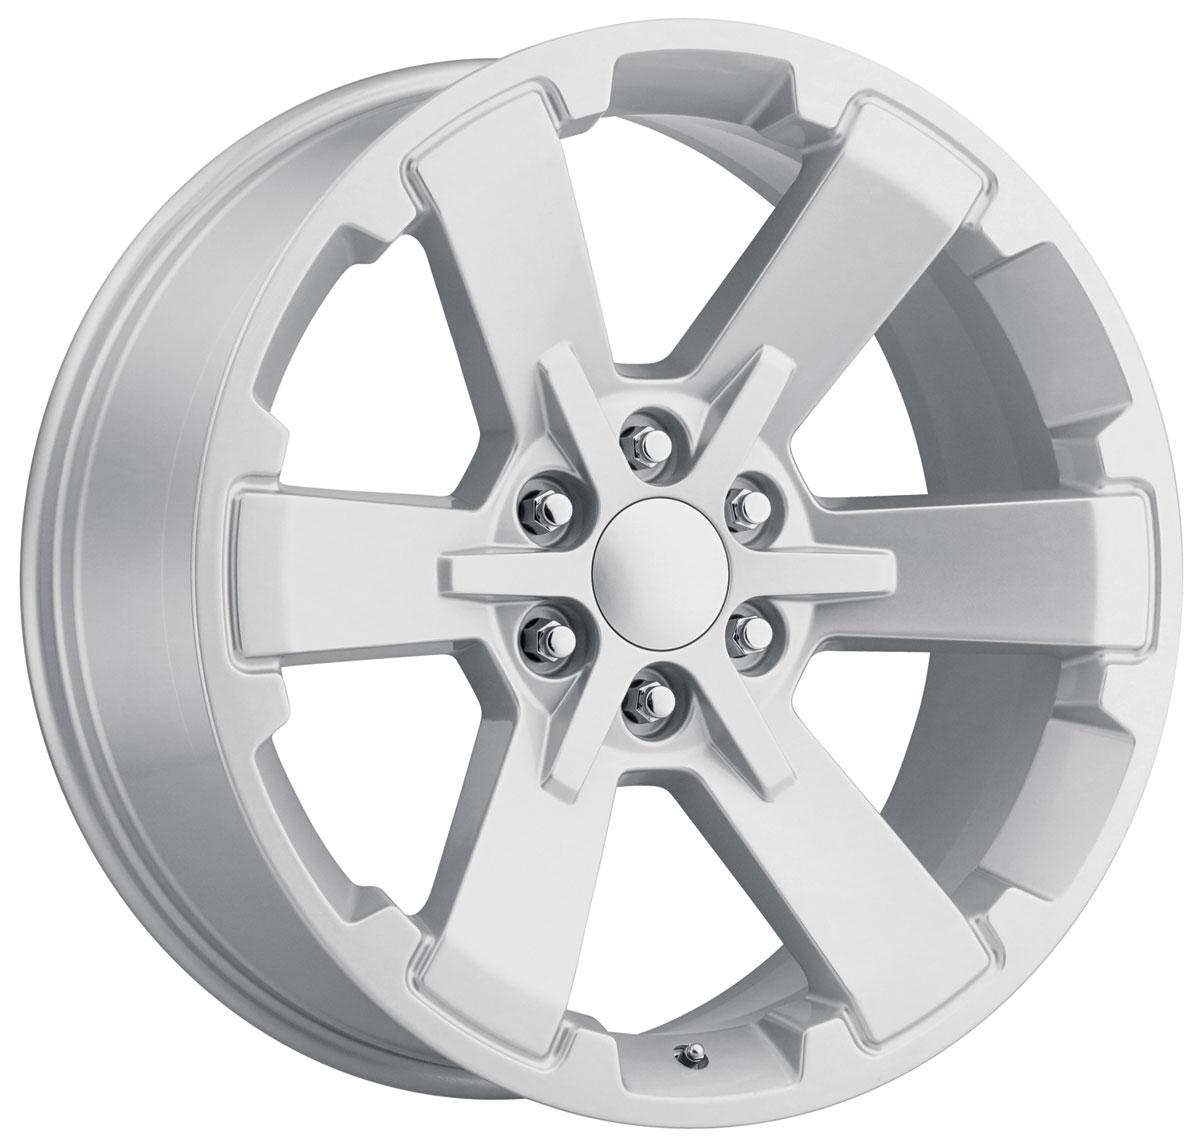 Wheel, Factory Reproduction, Dual Six Star, SRS 45, 22X9 6X5.5 +24 HB 78.1